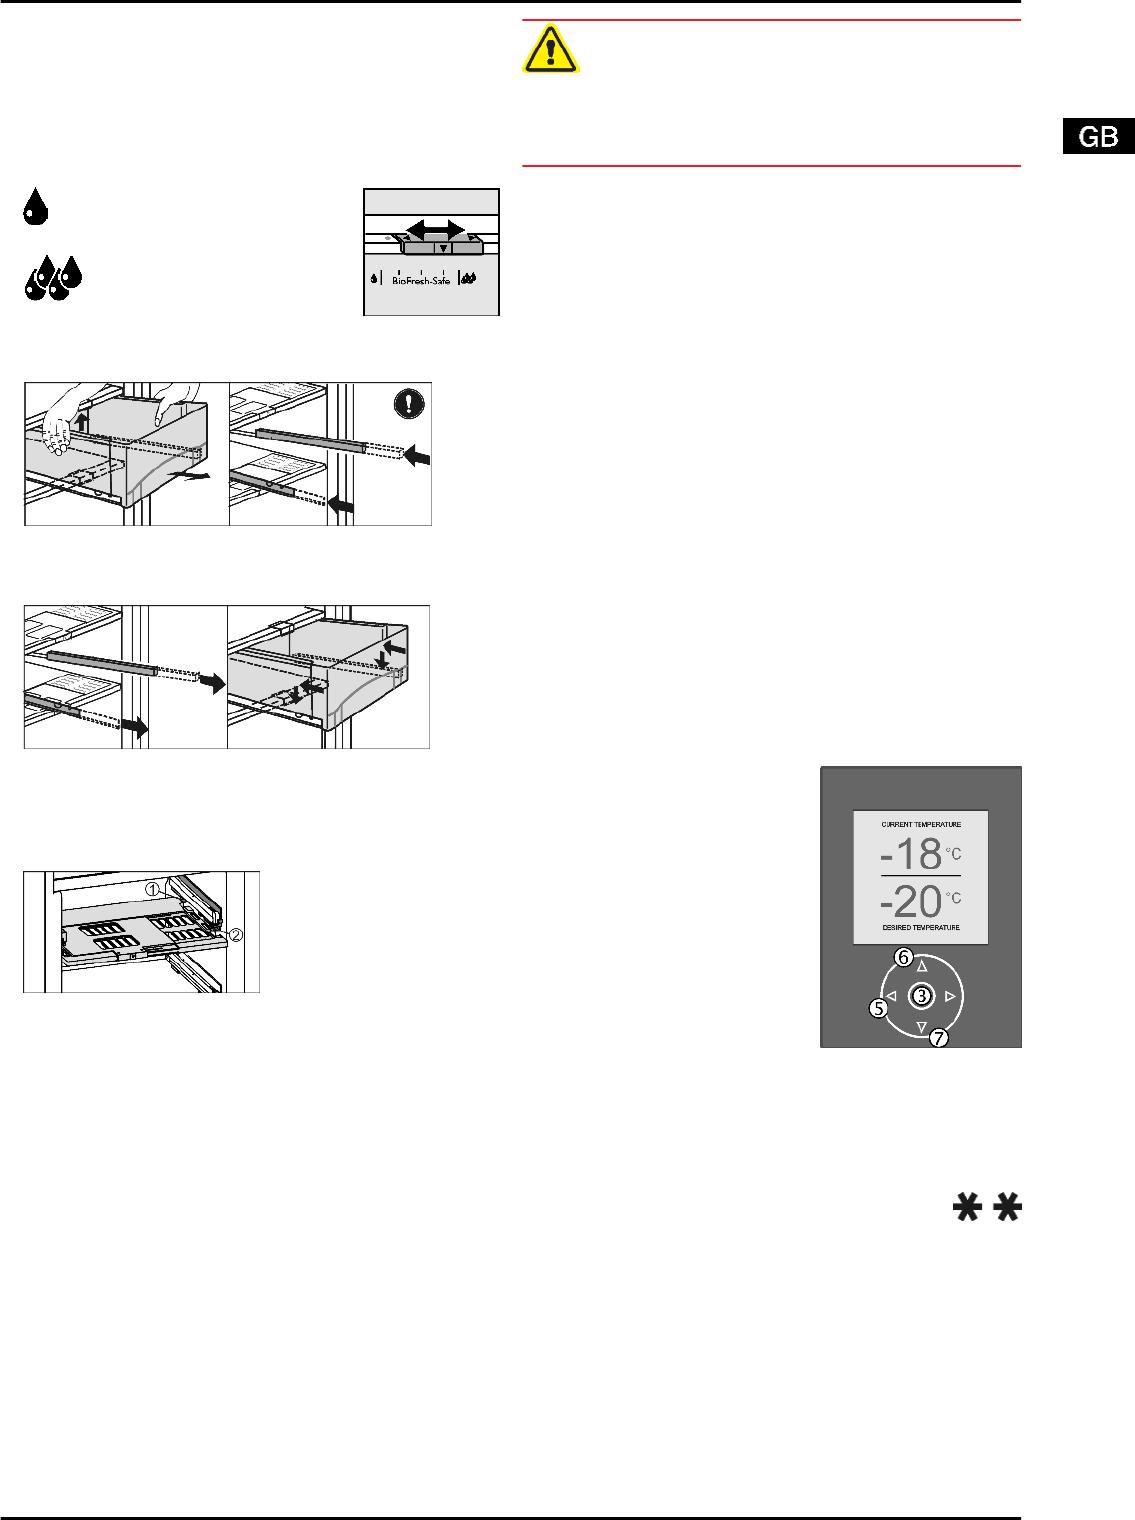 Handleiding Liebherr CBNES 3857 (pagina 19 van 26) (English)